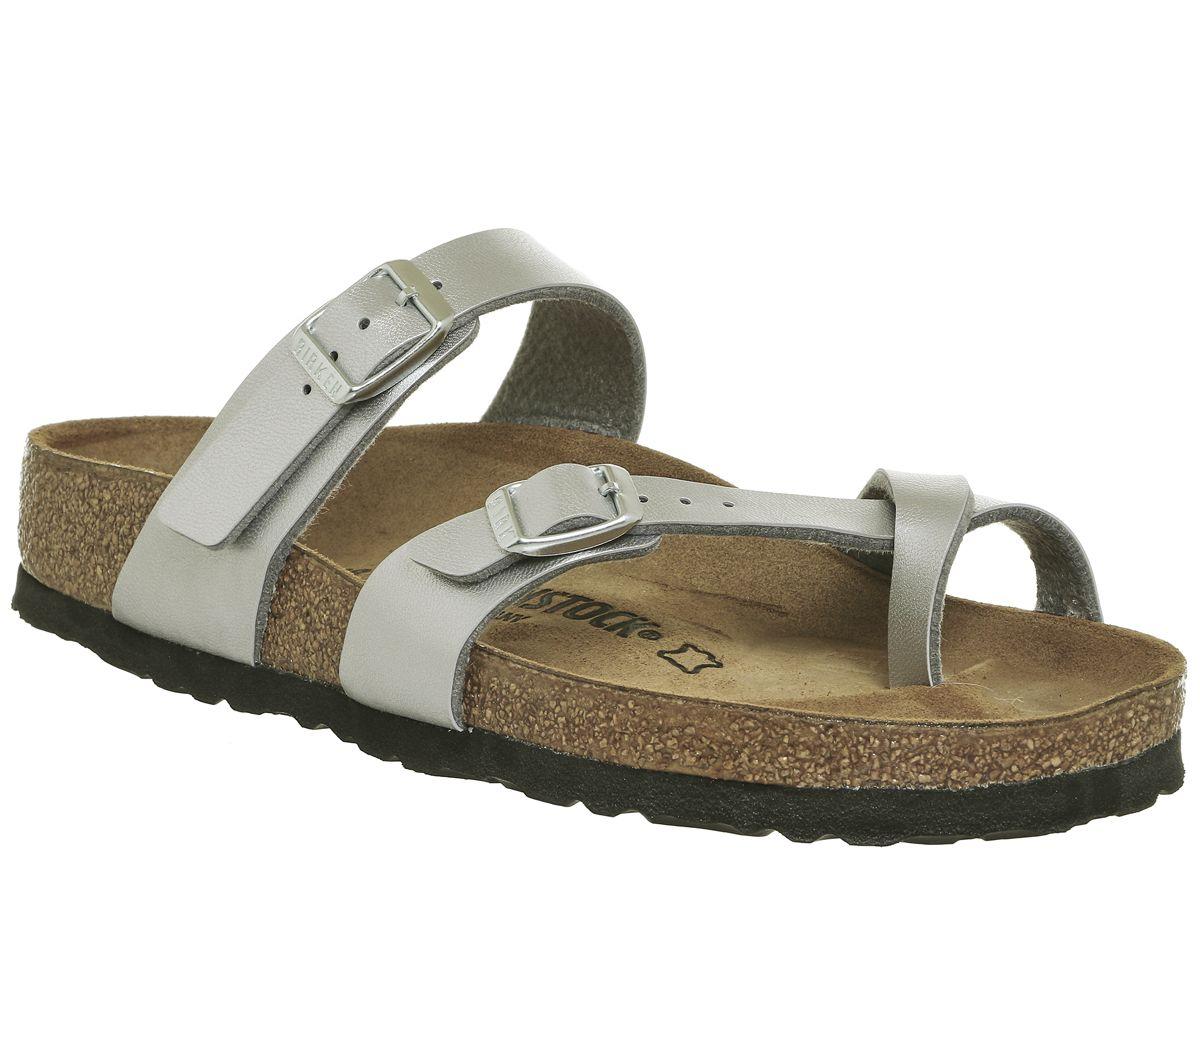 38be8d3fa16 Birkenstock Mayari Cross Strap Sandals Silver - Sandals